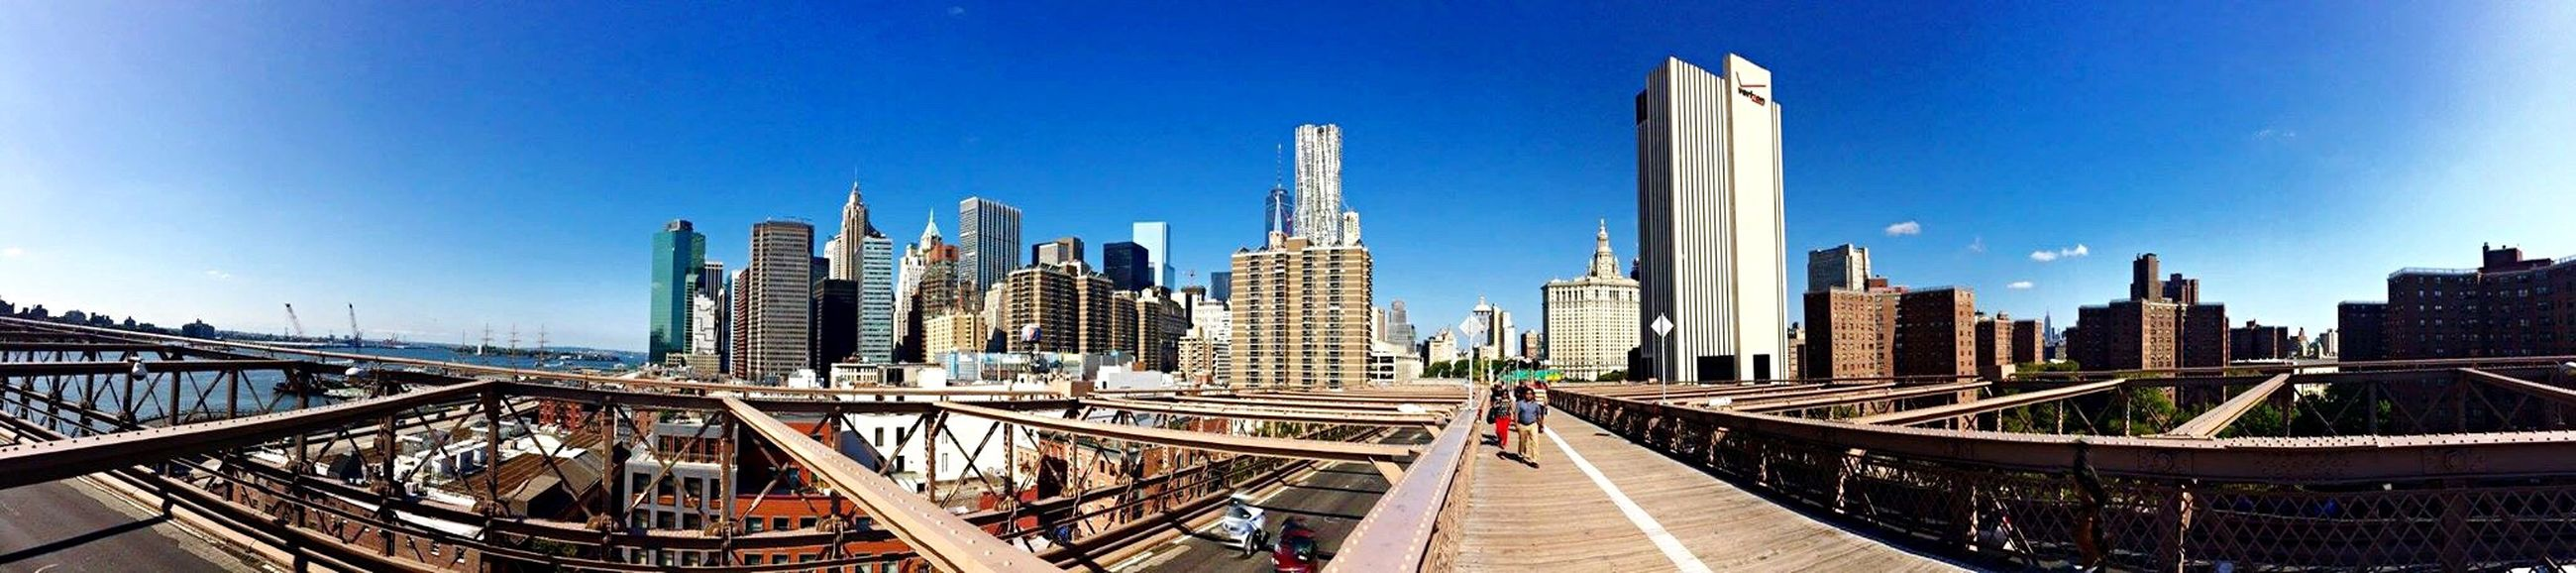 Amazing Panoramic Photography Hello World Hello New York! Brookline Bridge Taking Photos Traveling Bestoftheday